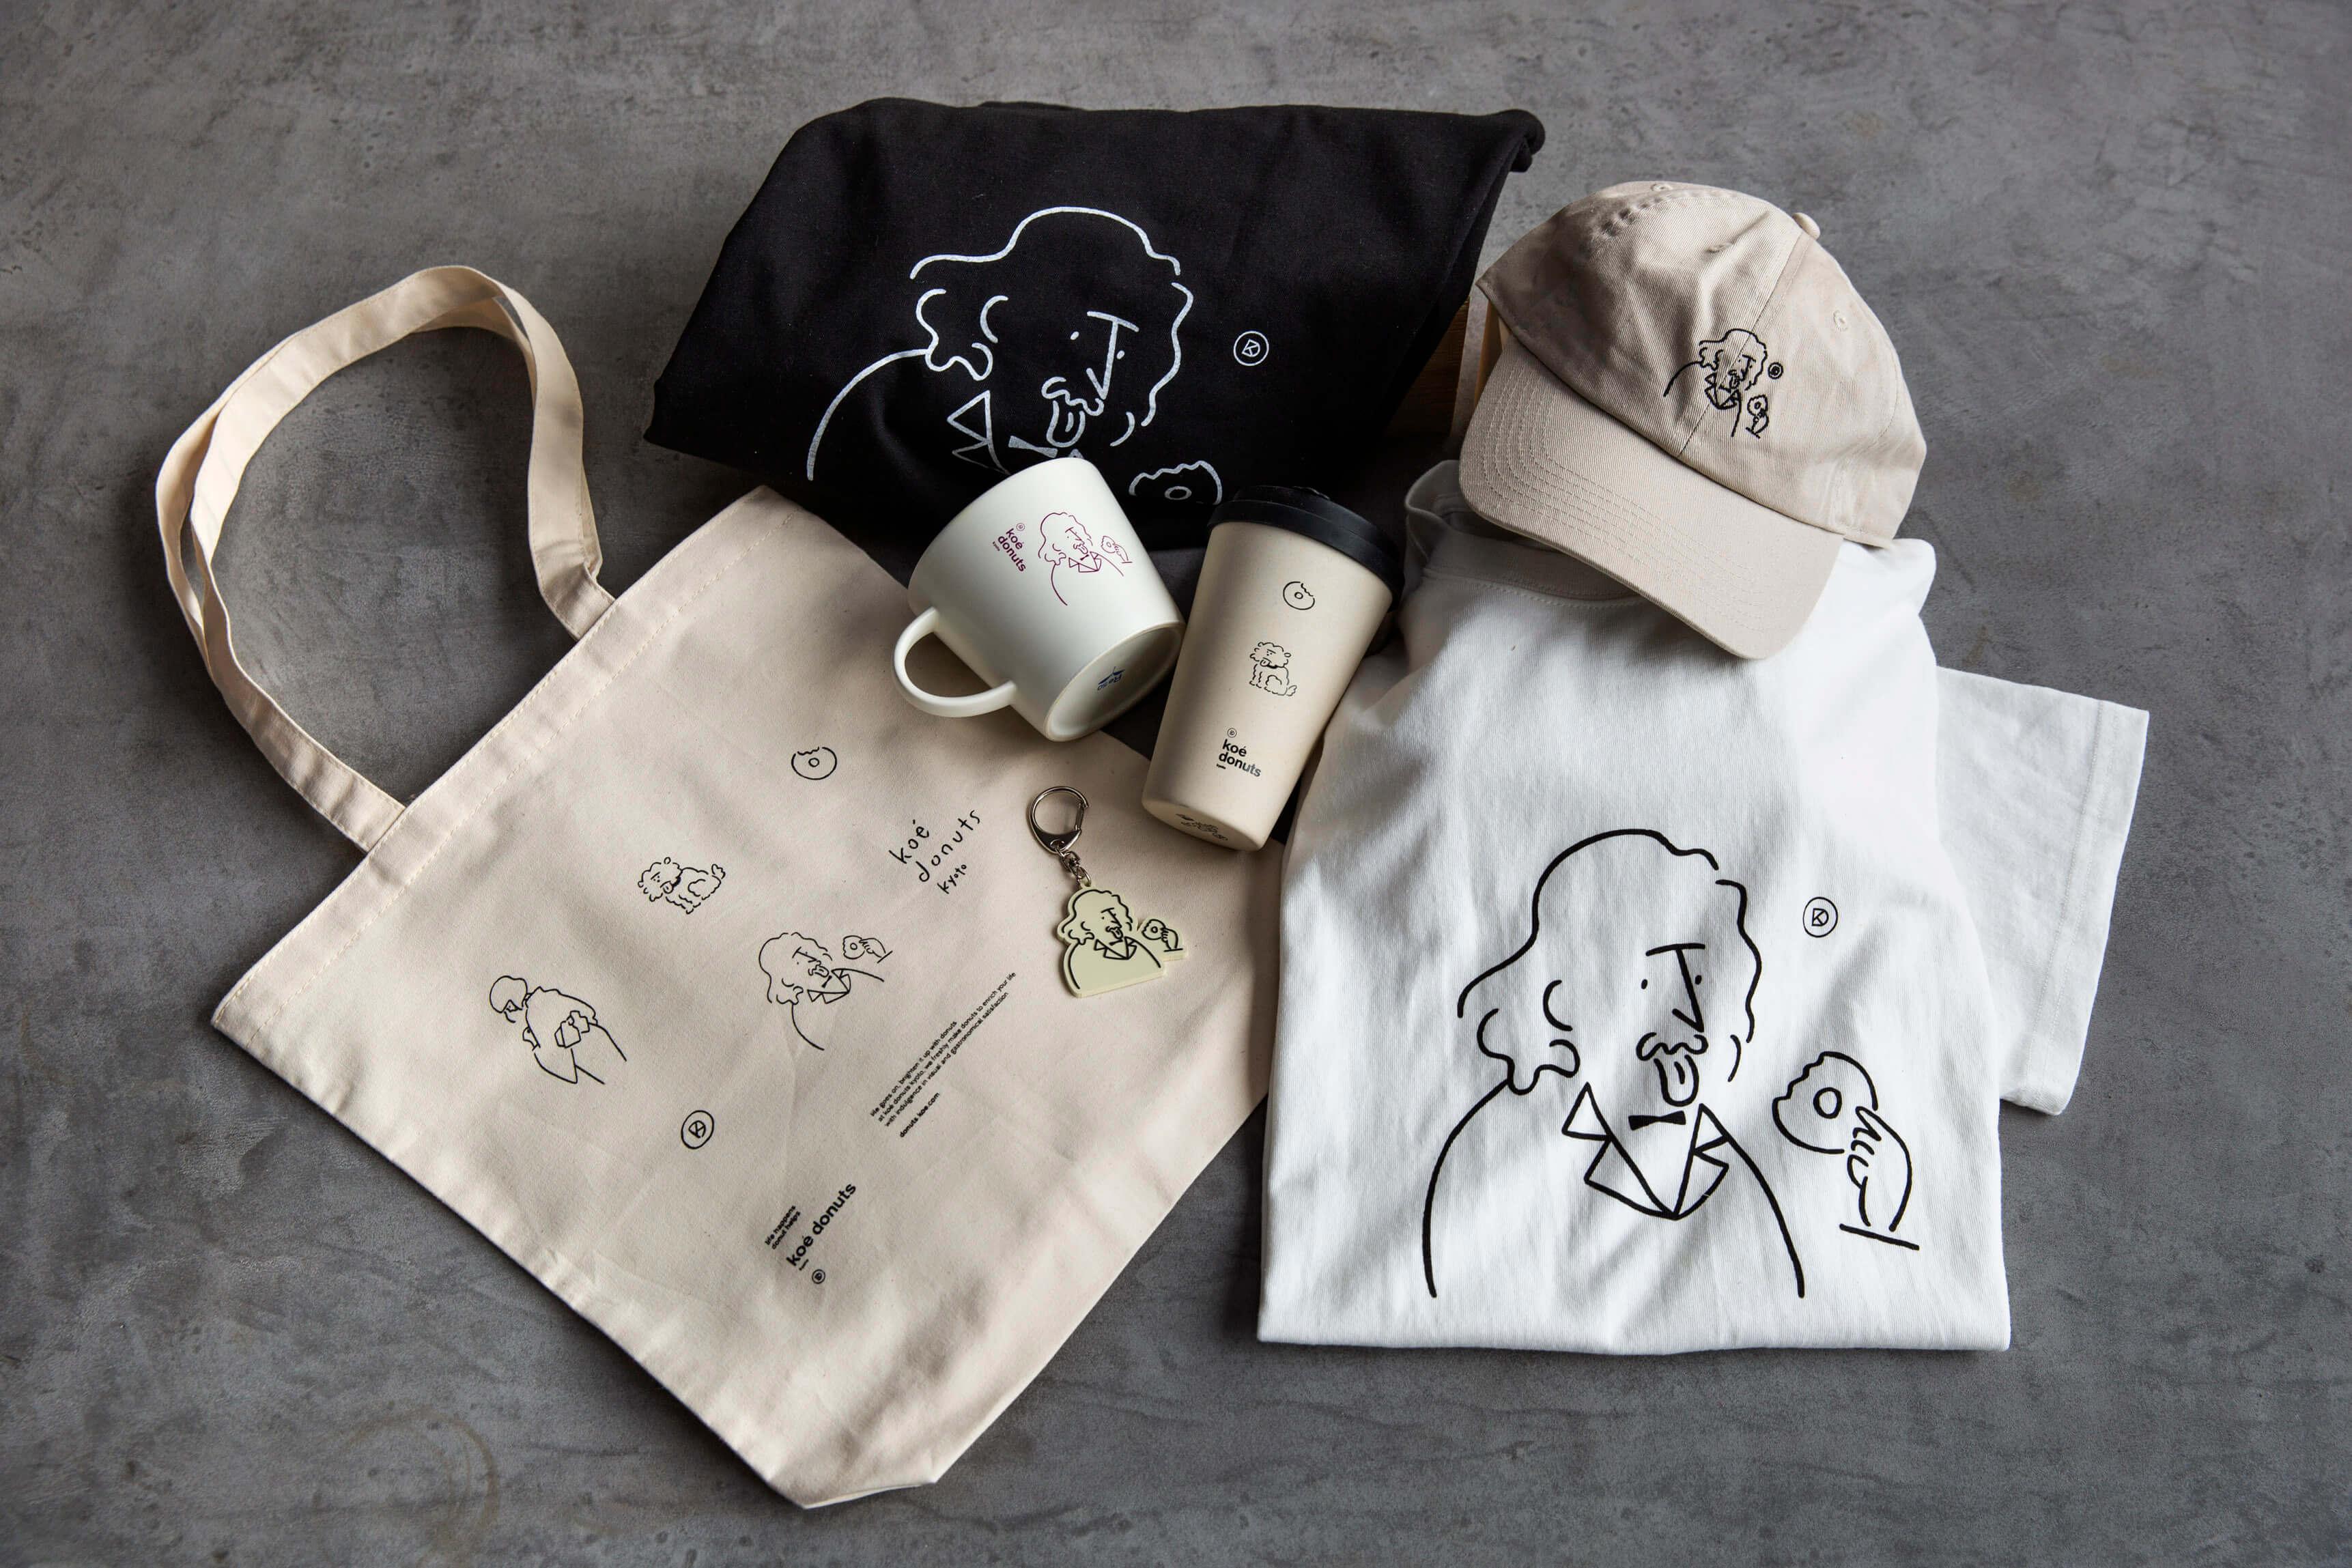 gennteigoods koe donuts kyoto コエドーナツ 渋谷 ポップアップストア pop up store sub2